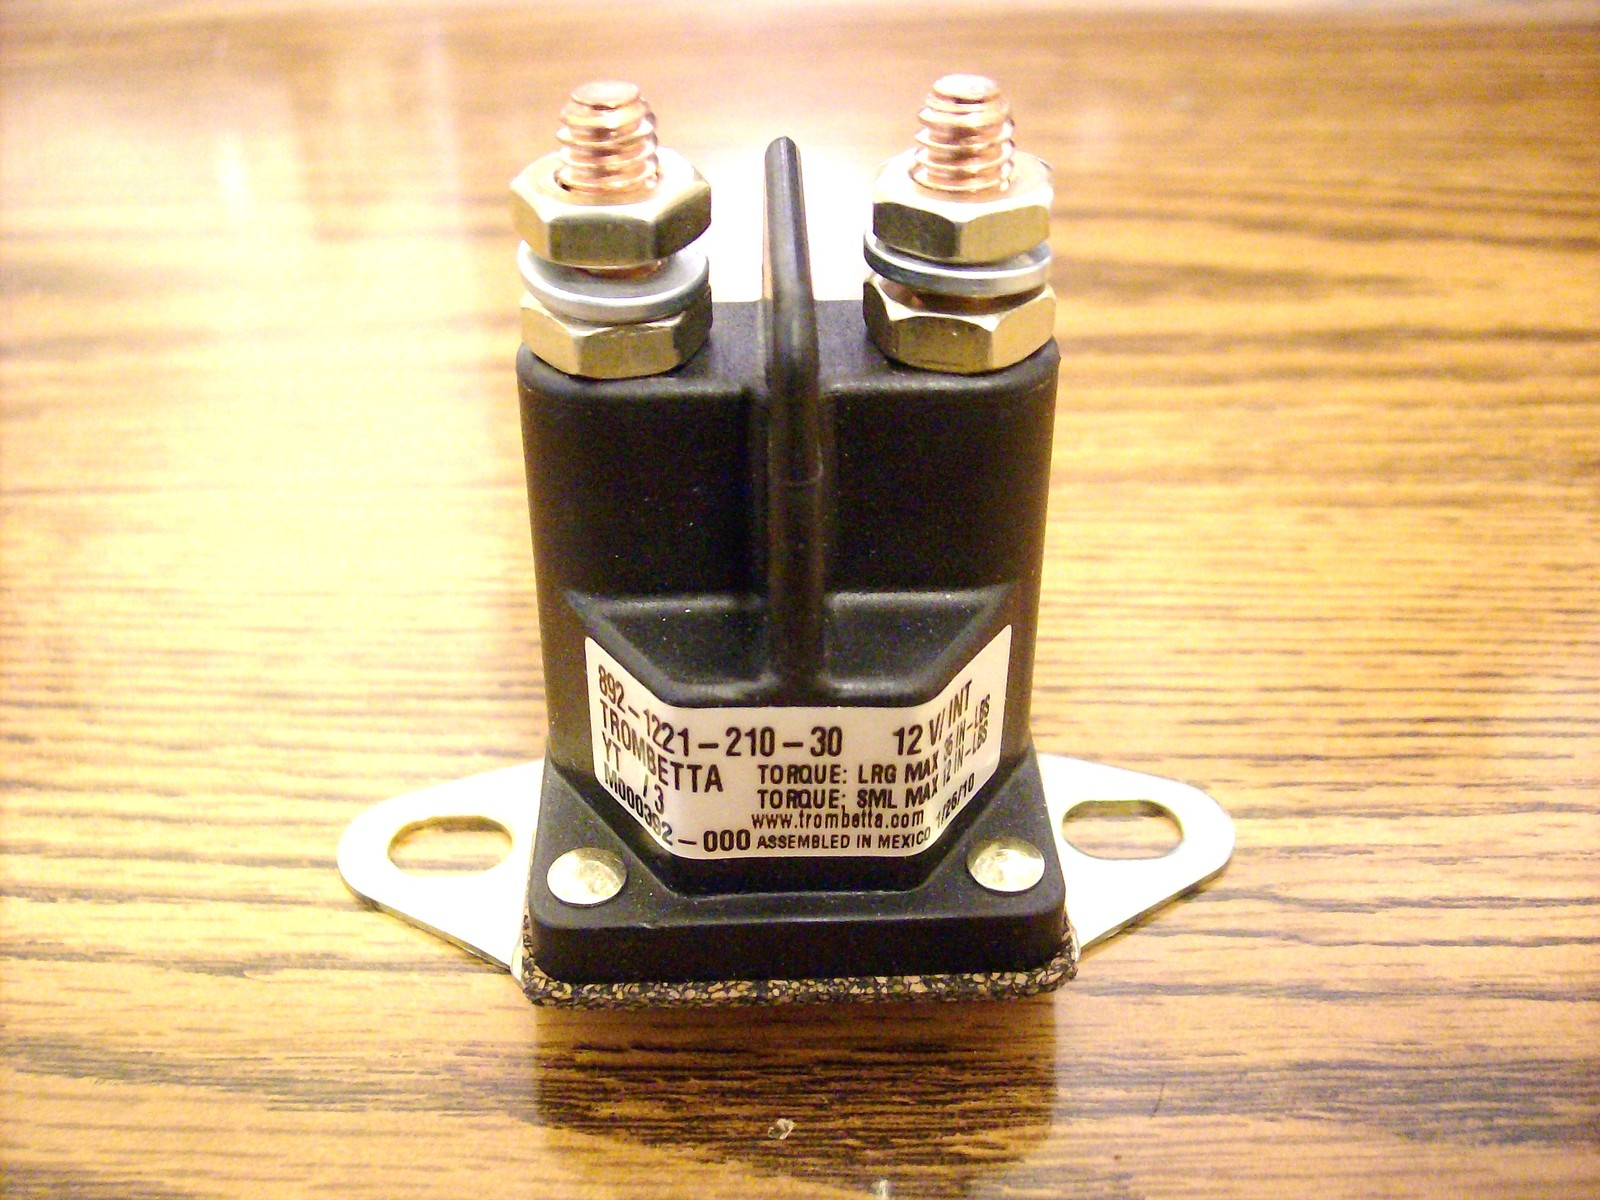 Starter solenoid for Snapper and Toro 75622, 740207, 110167, 47-1910, 7075622SM